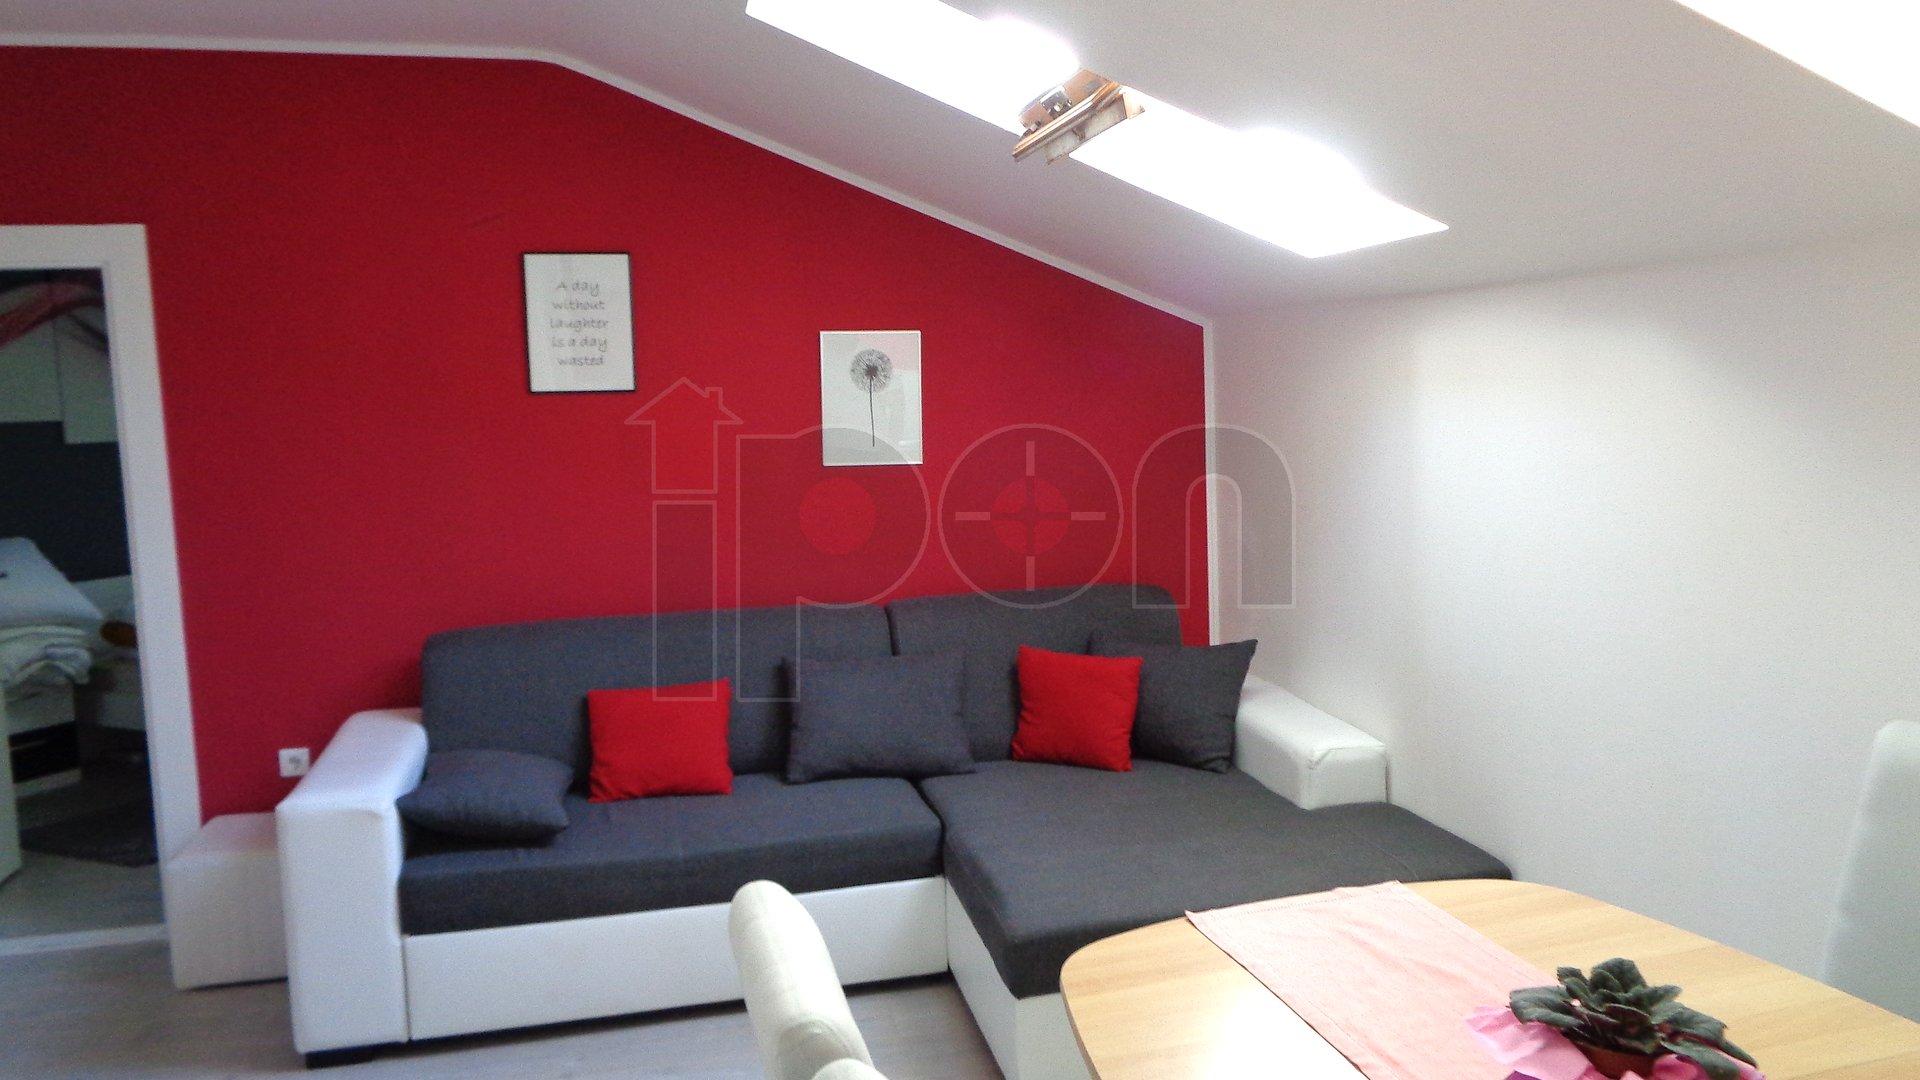 Appartamento, 45 m2, Vendita, Rijeka - Centar